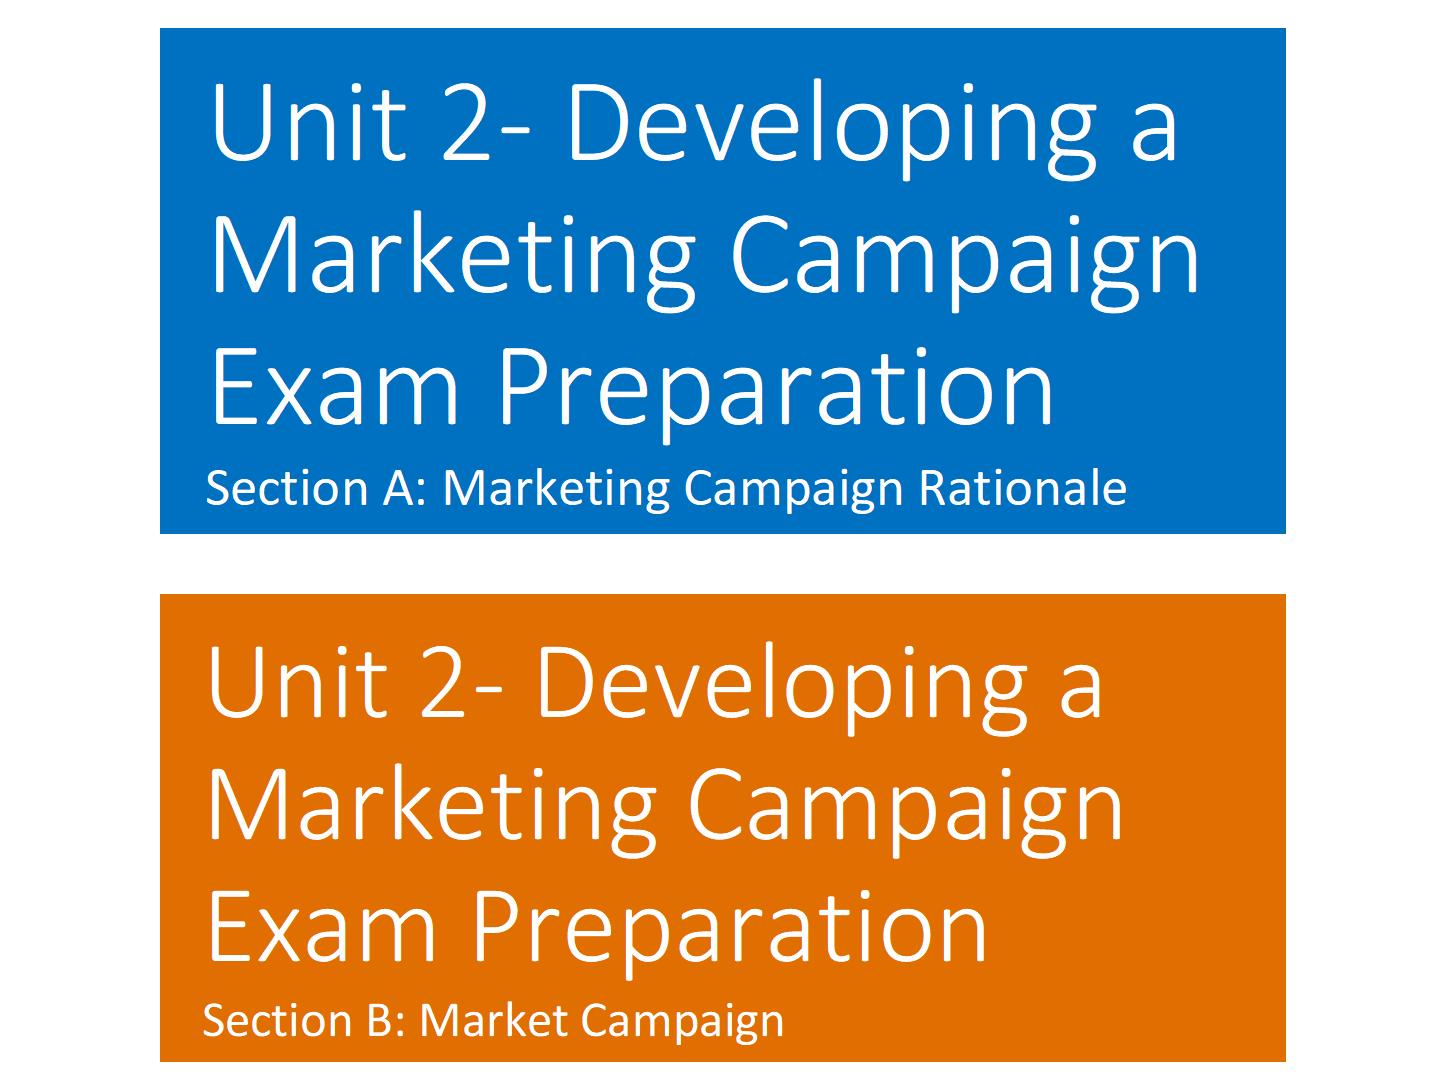 Developing a Marketing Campaign Exam Preparation